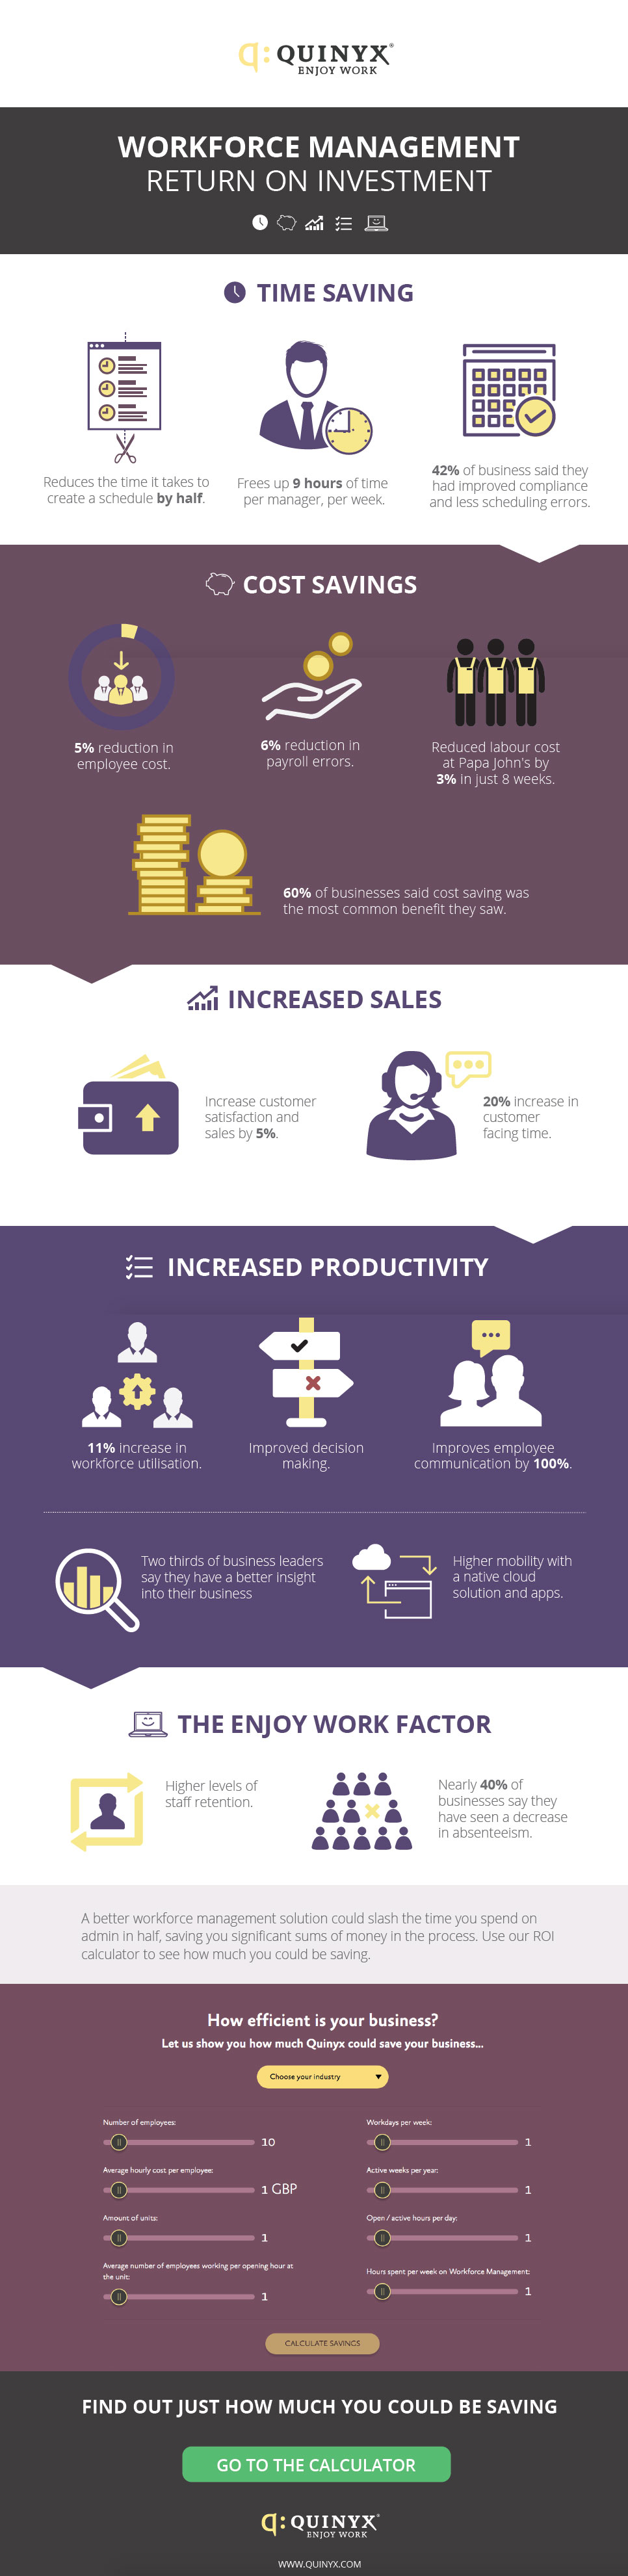 Workforce Management ROI Infographic